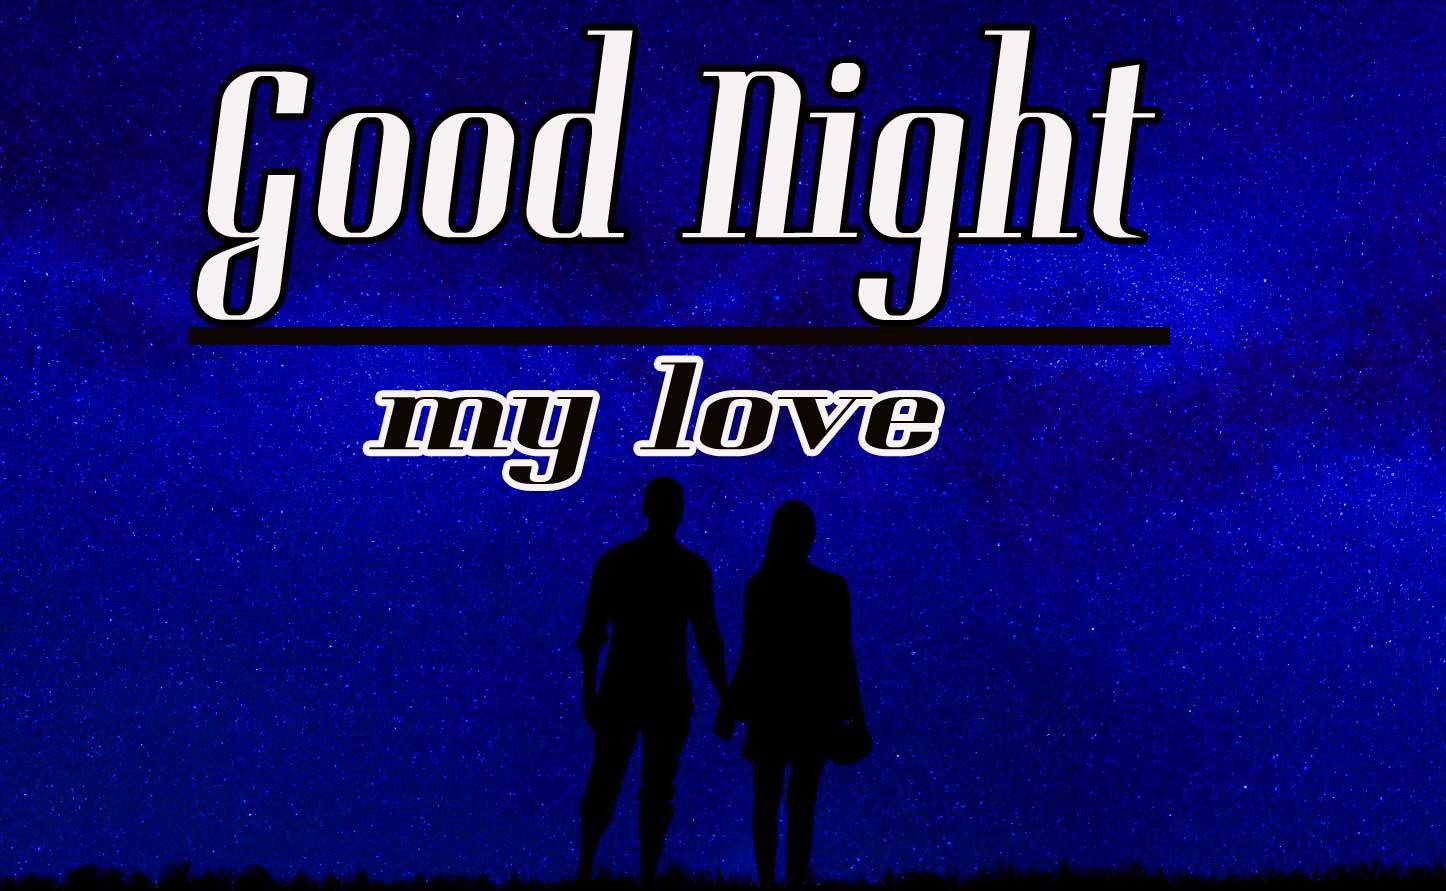 For Mobile Good Night Wallpaper for Love Couple